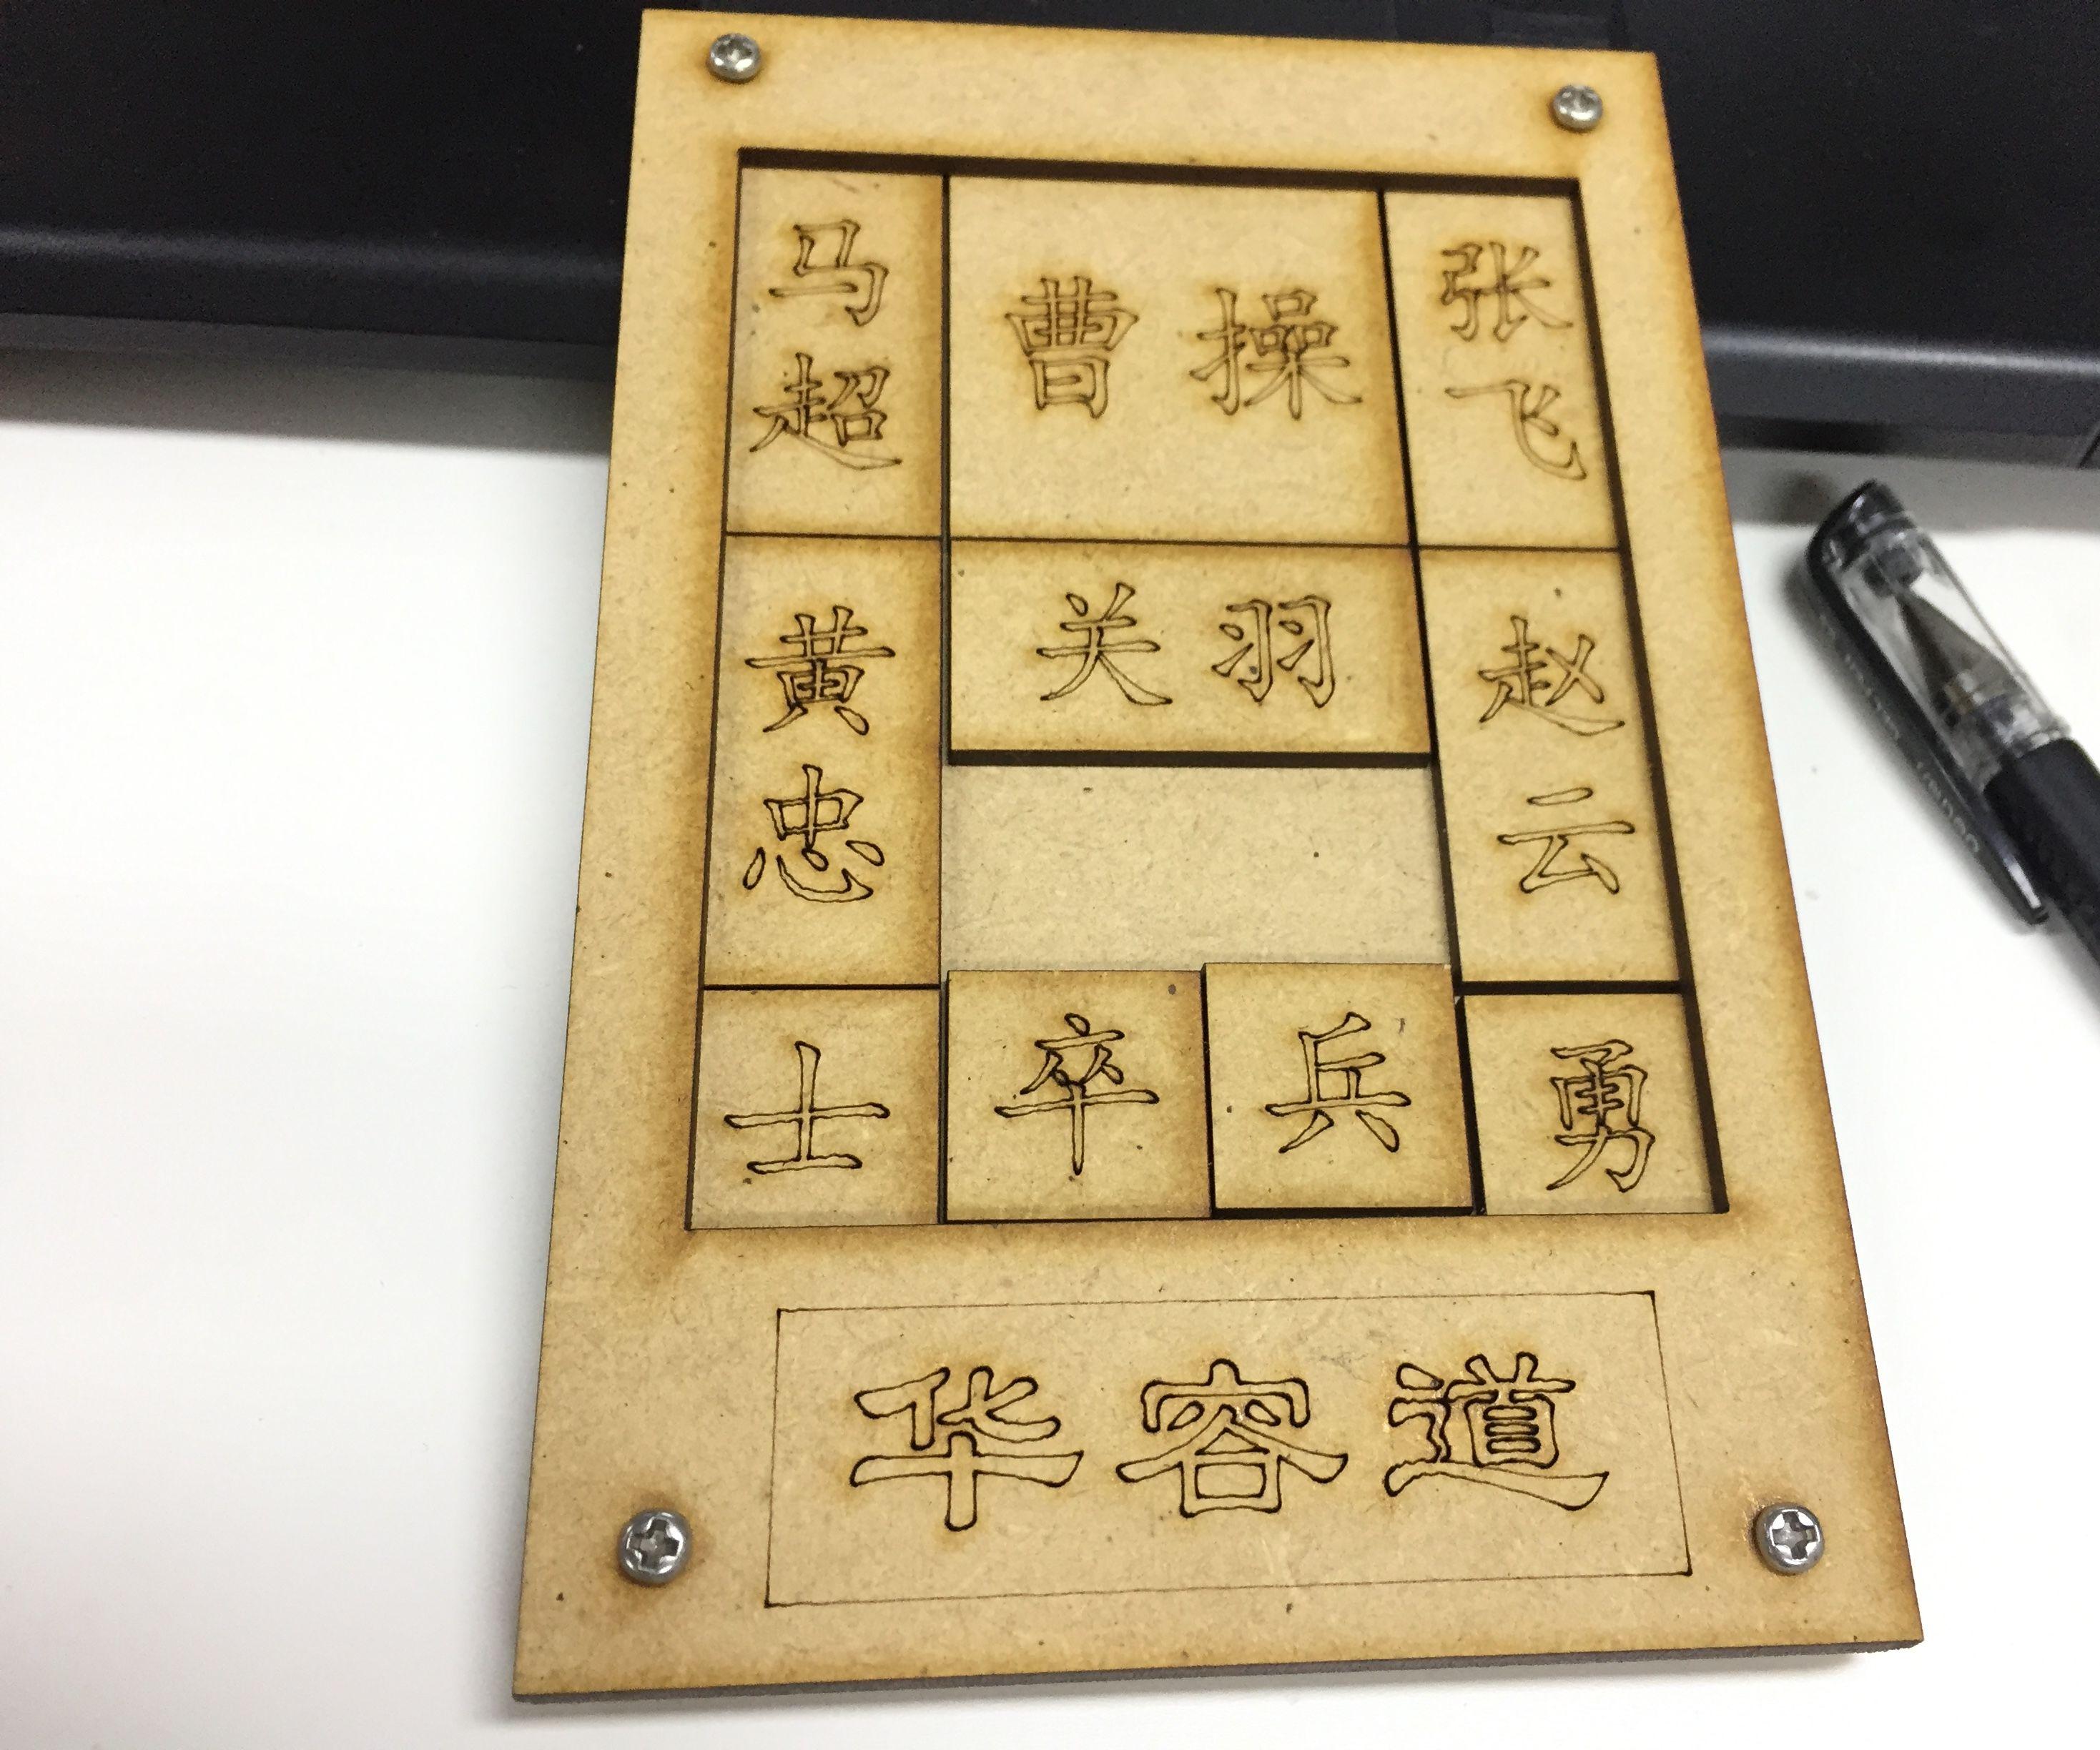 Laser Cut a Traditional Chinese Wooden Game Huarong Dao(Klotski)